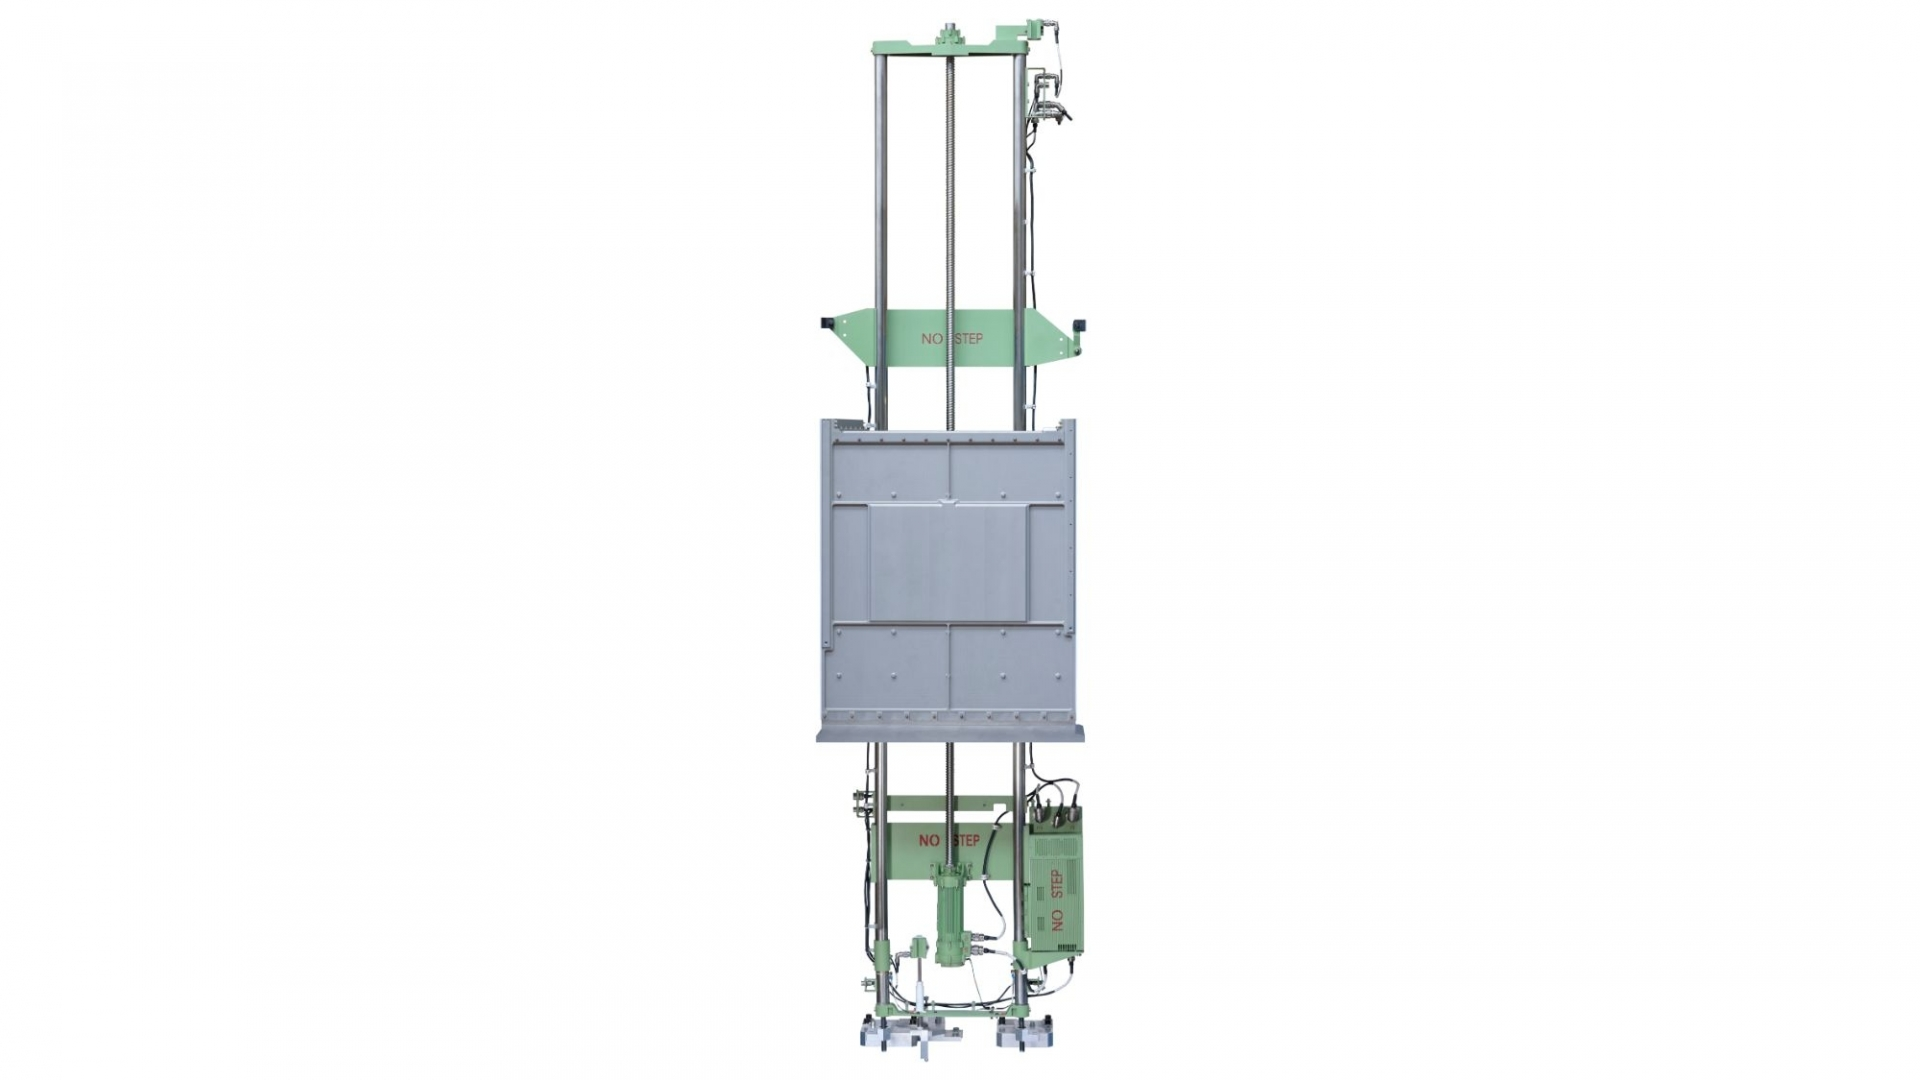 electromechanical actuators umbragroup